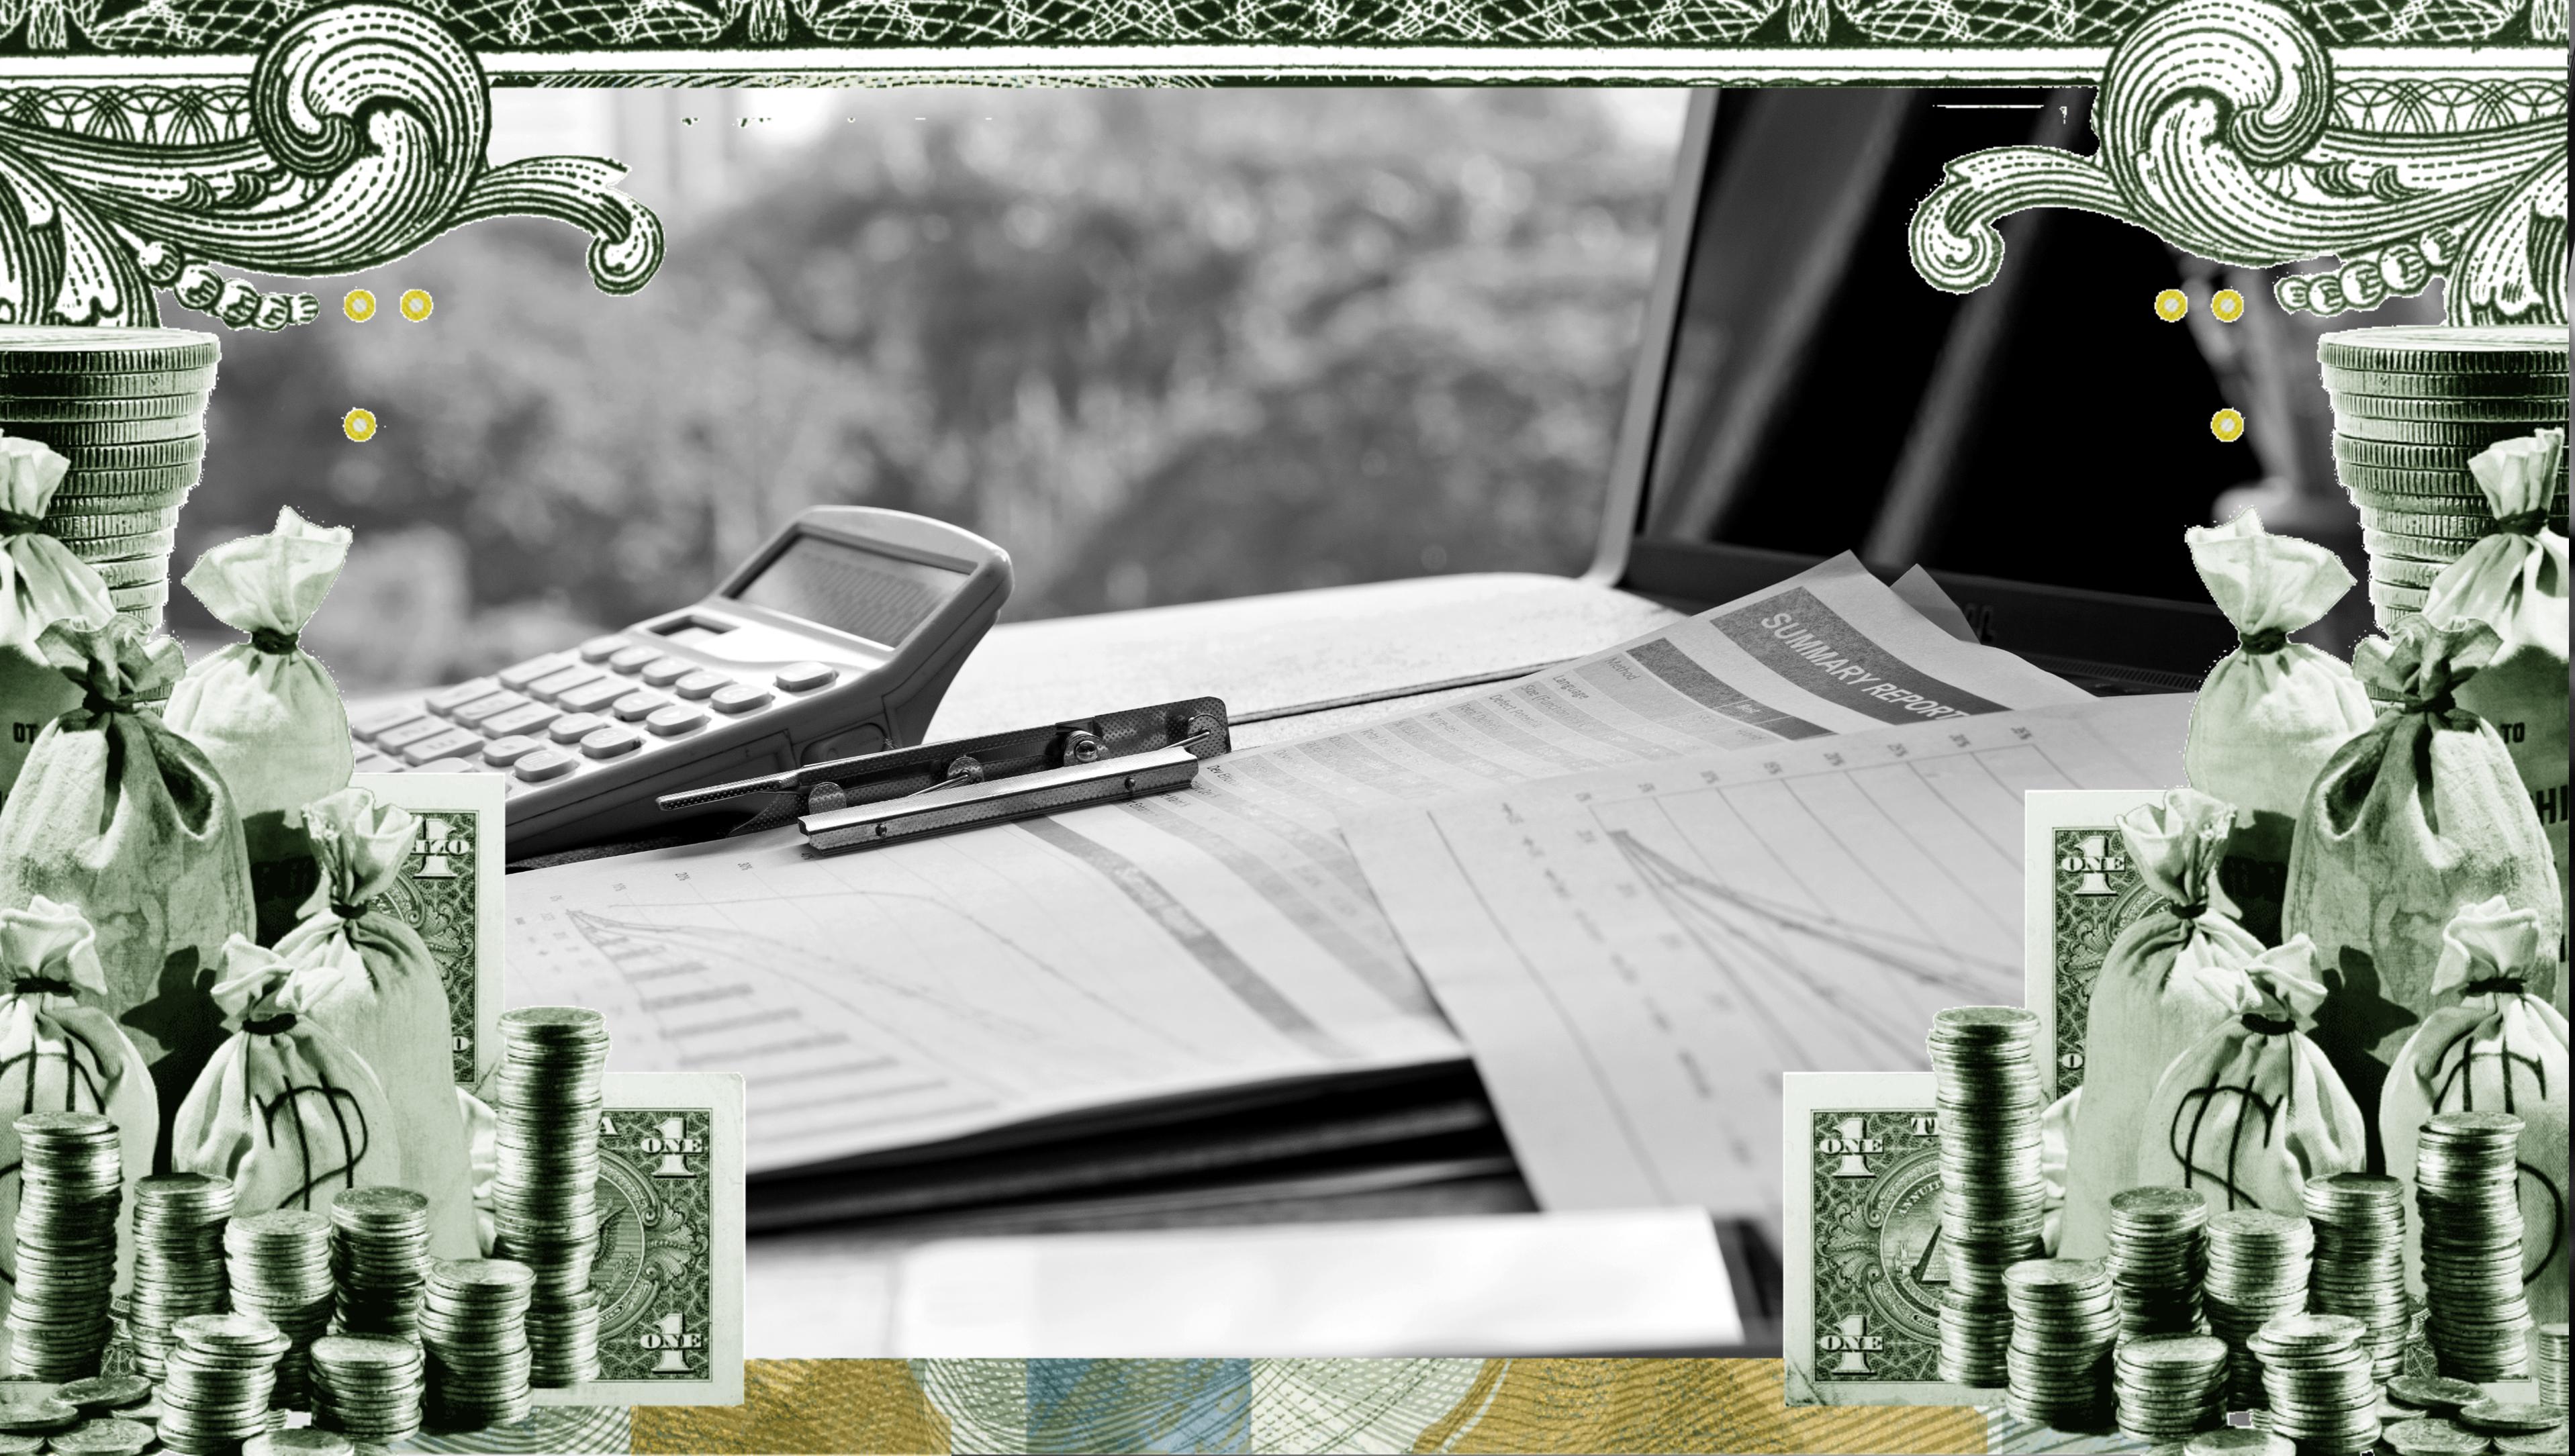 A border of money around office supplies